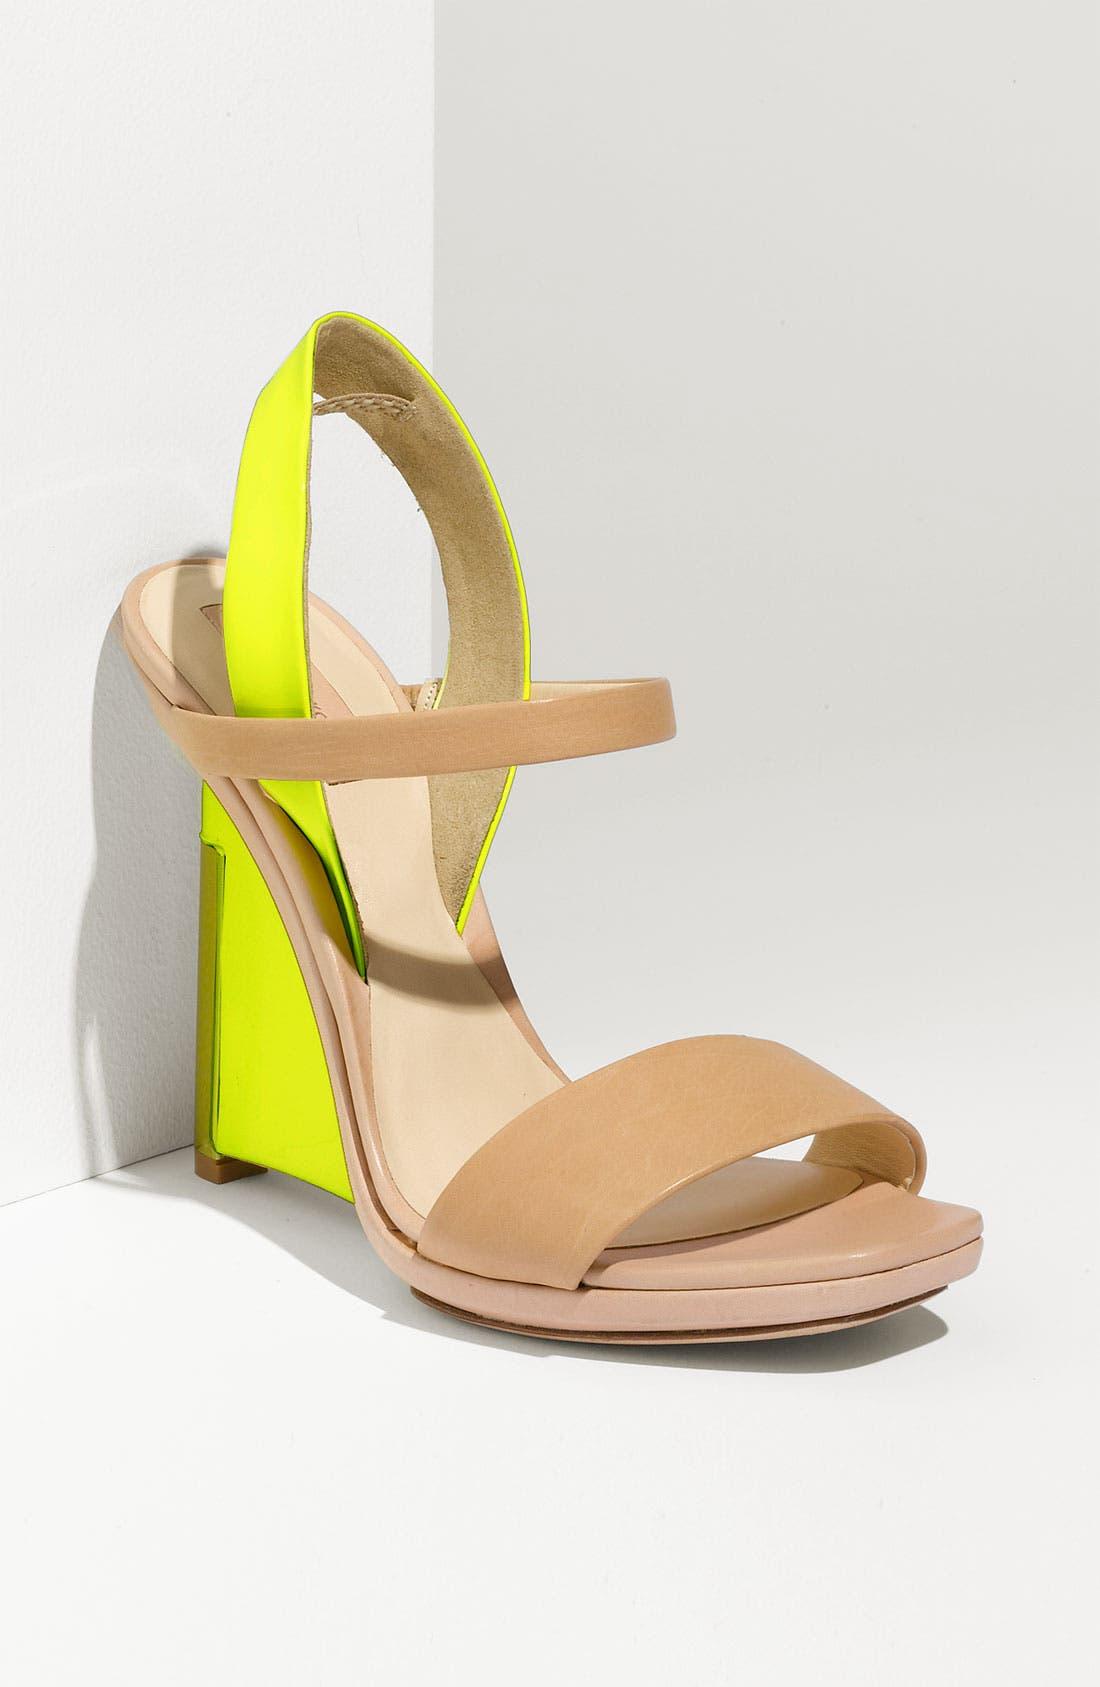 Alternate Image 1 Selected - Reed Krakoff 'Architect' Wedge Sandal